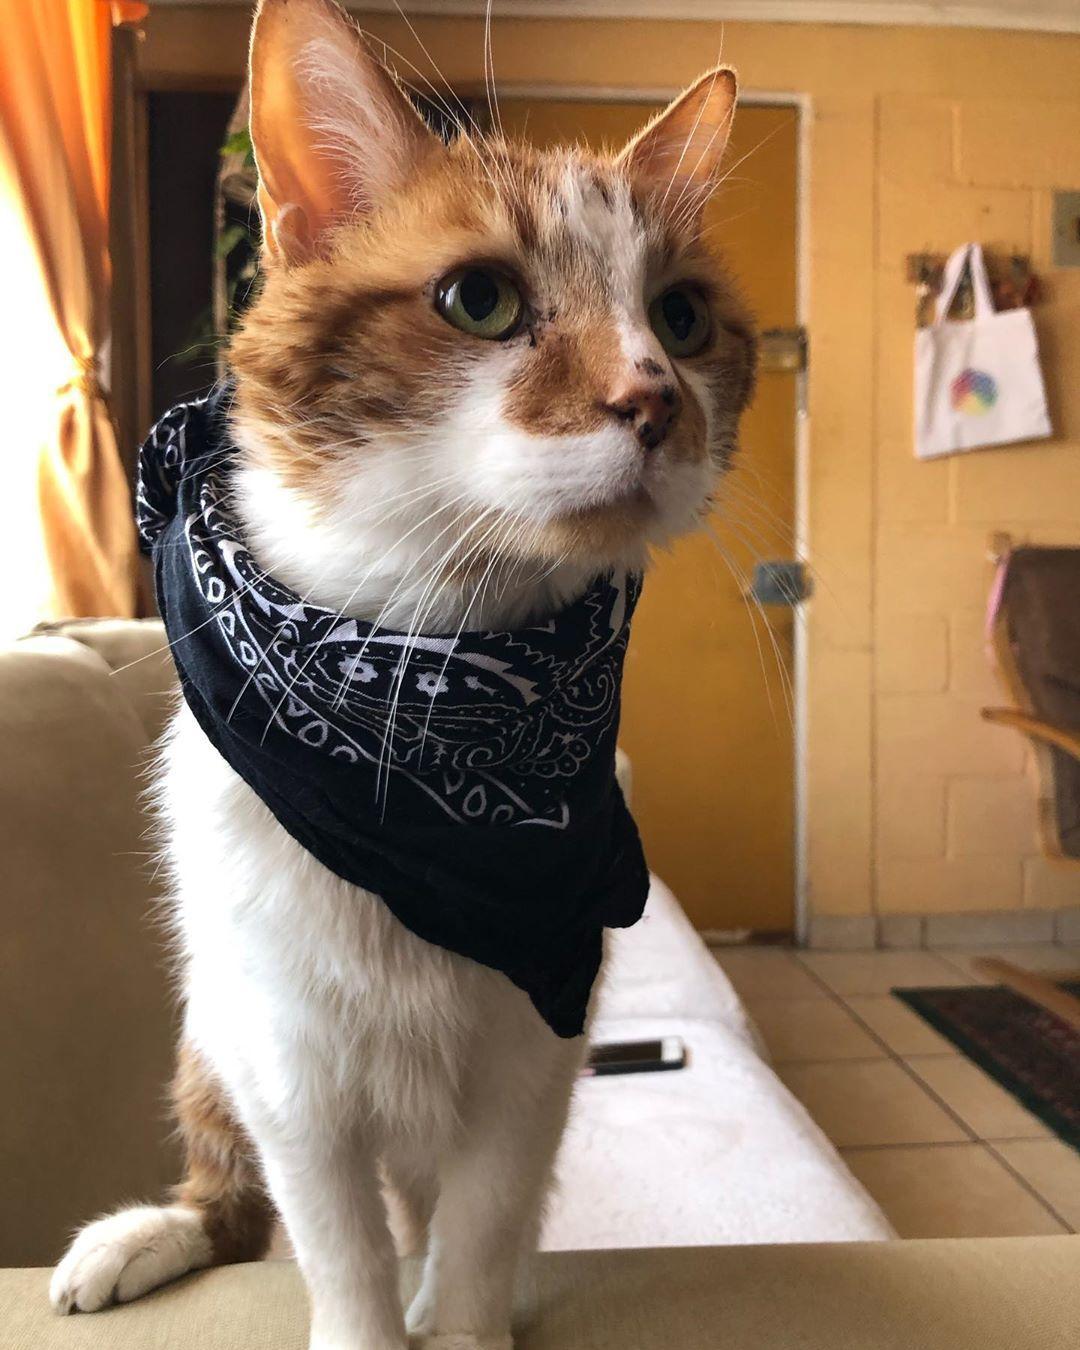 El Rusio Mata Pacos No Muy Comodo Pero Queria Ser Parte Cat Day Funny Cat Videos Cats